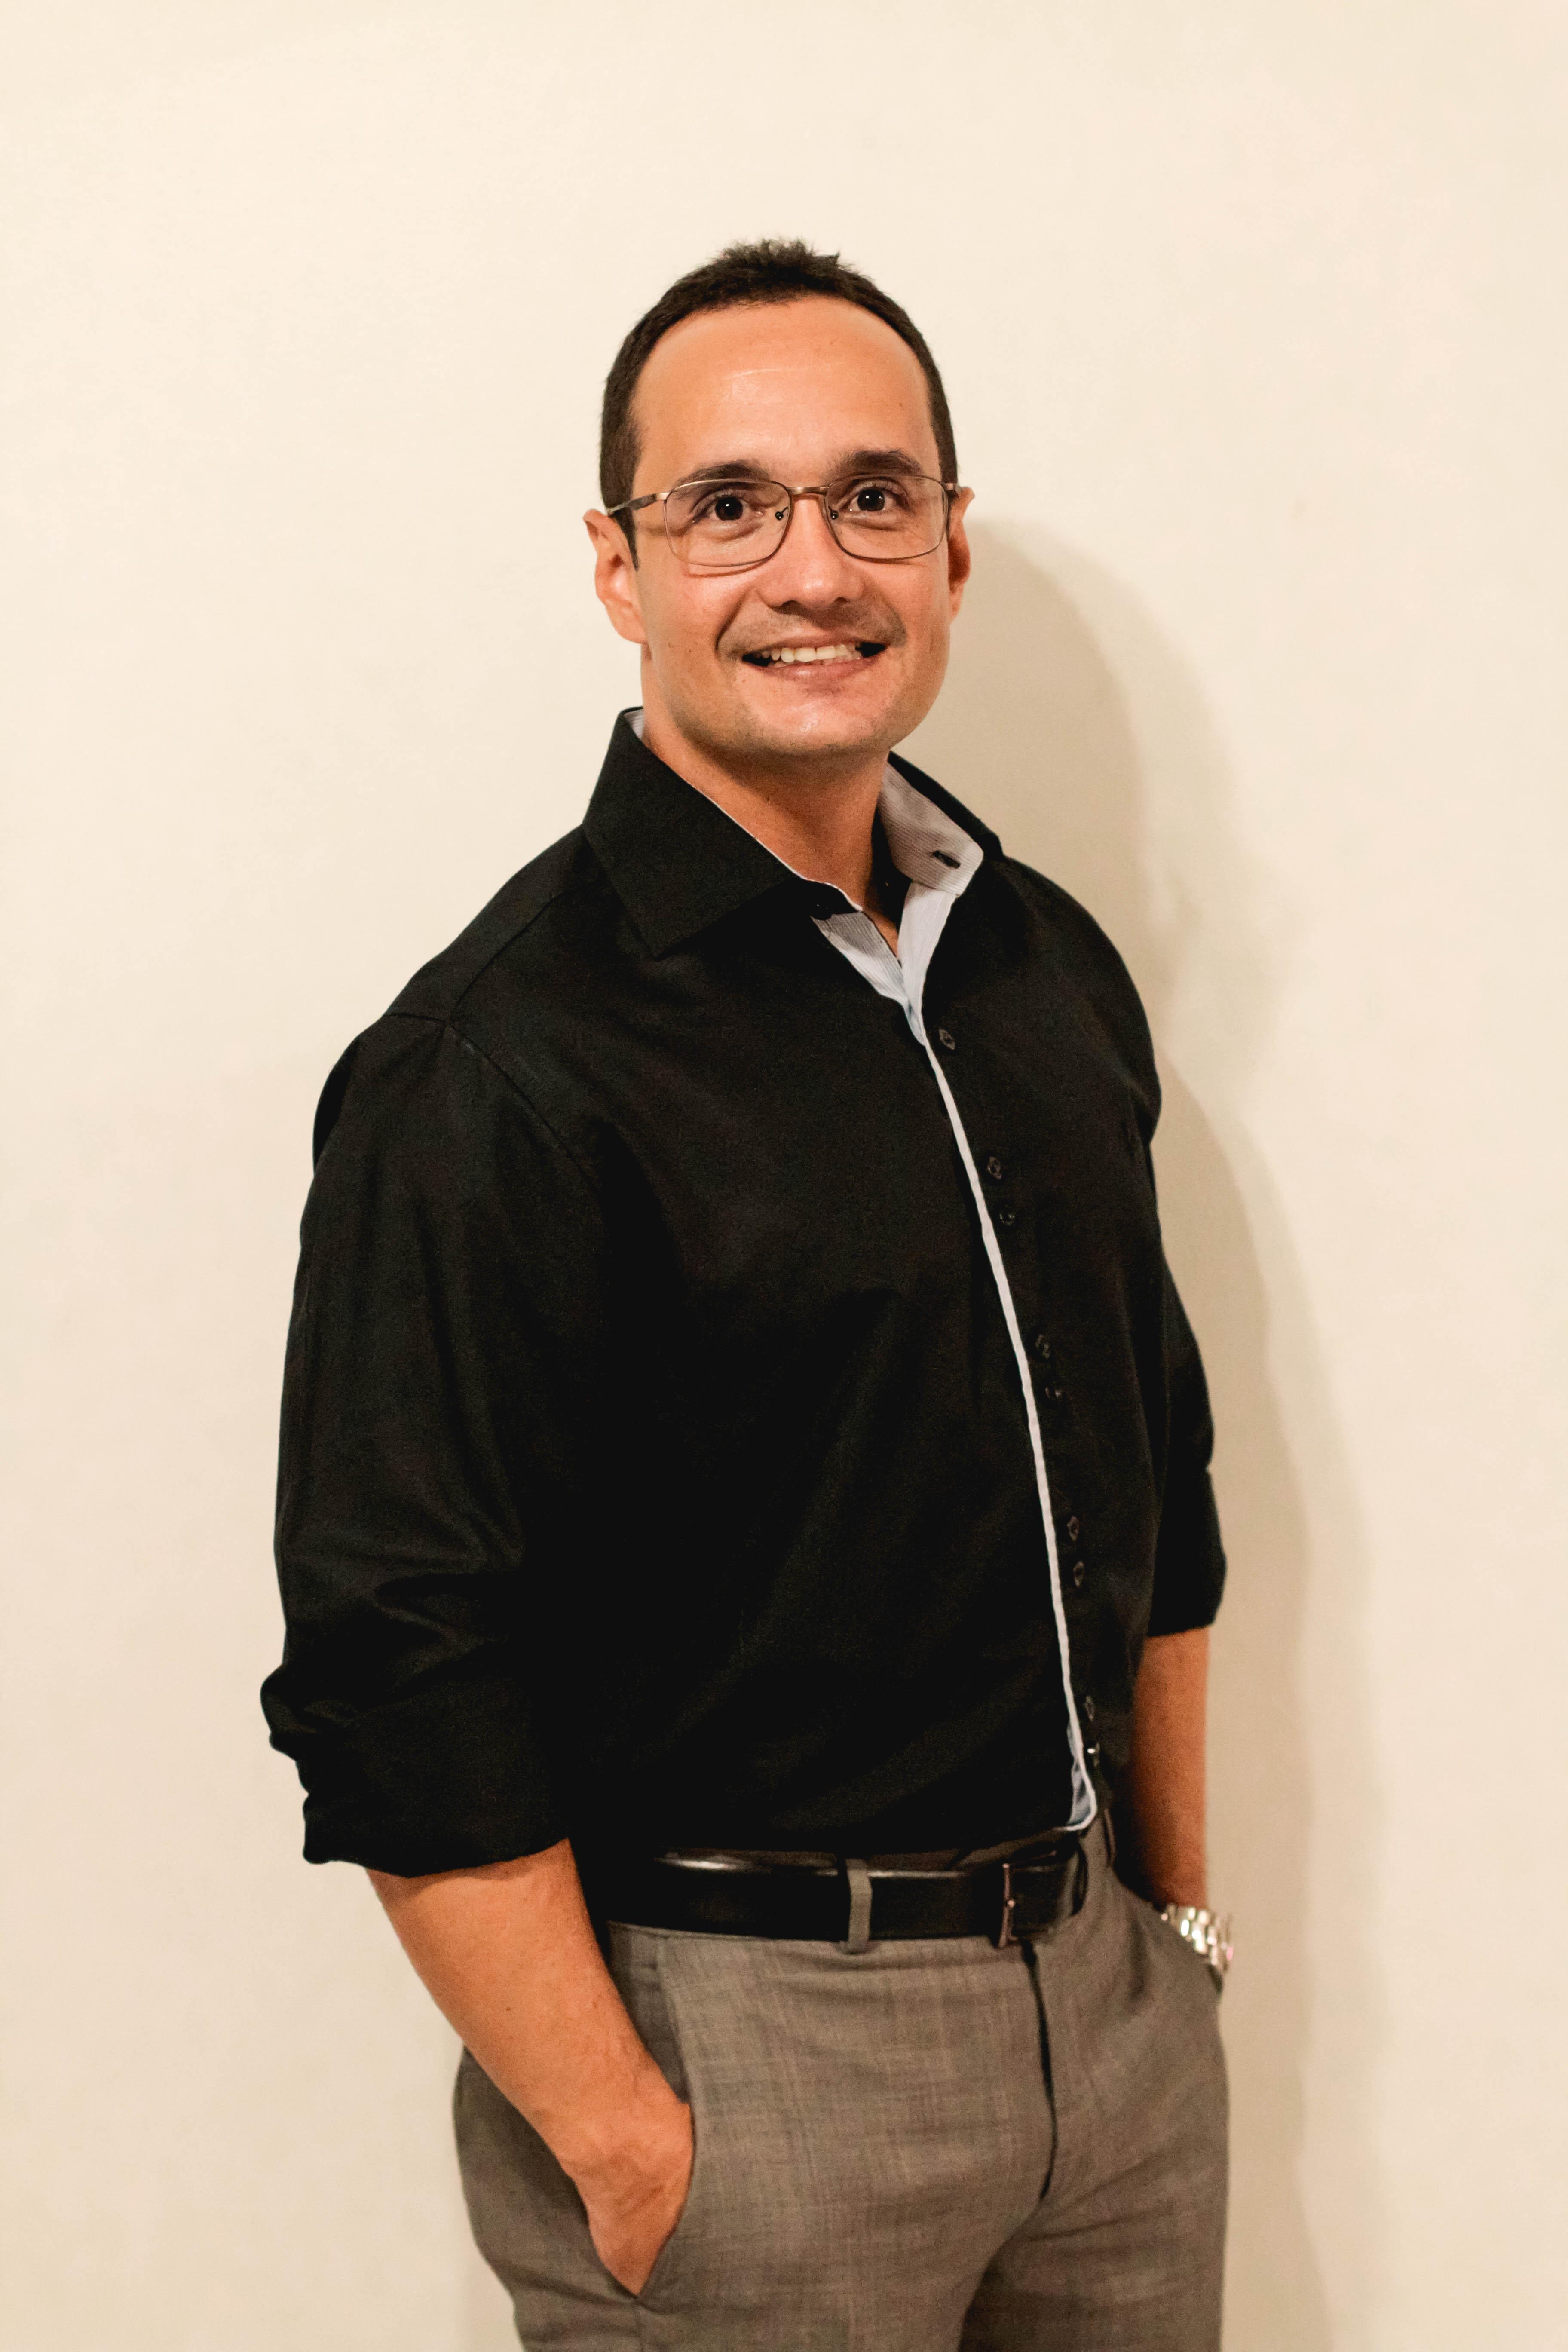 Professor Cristiano Brandão